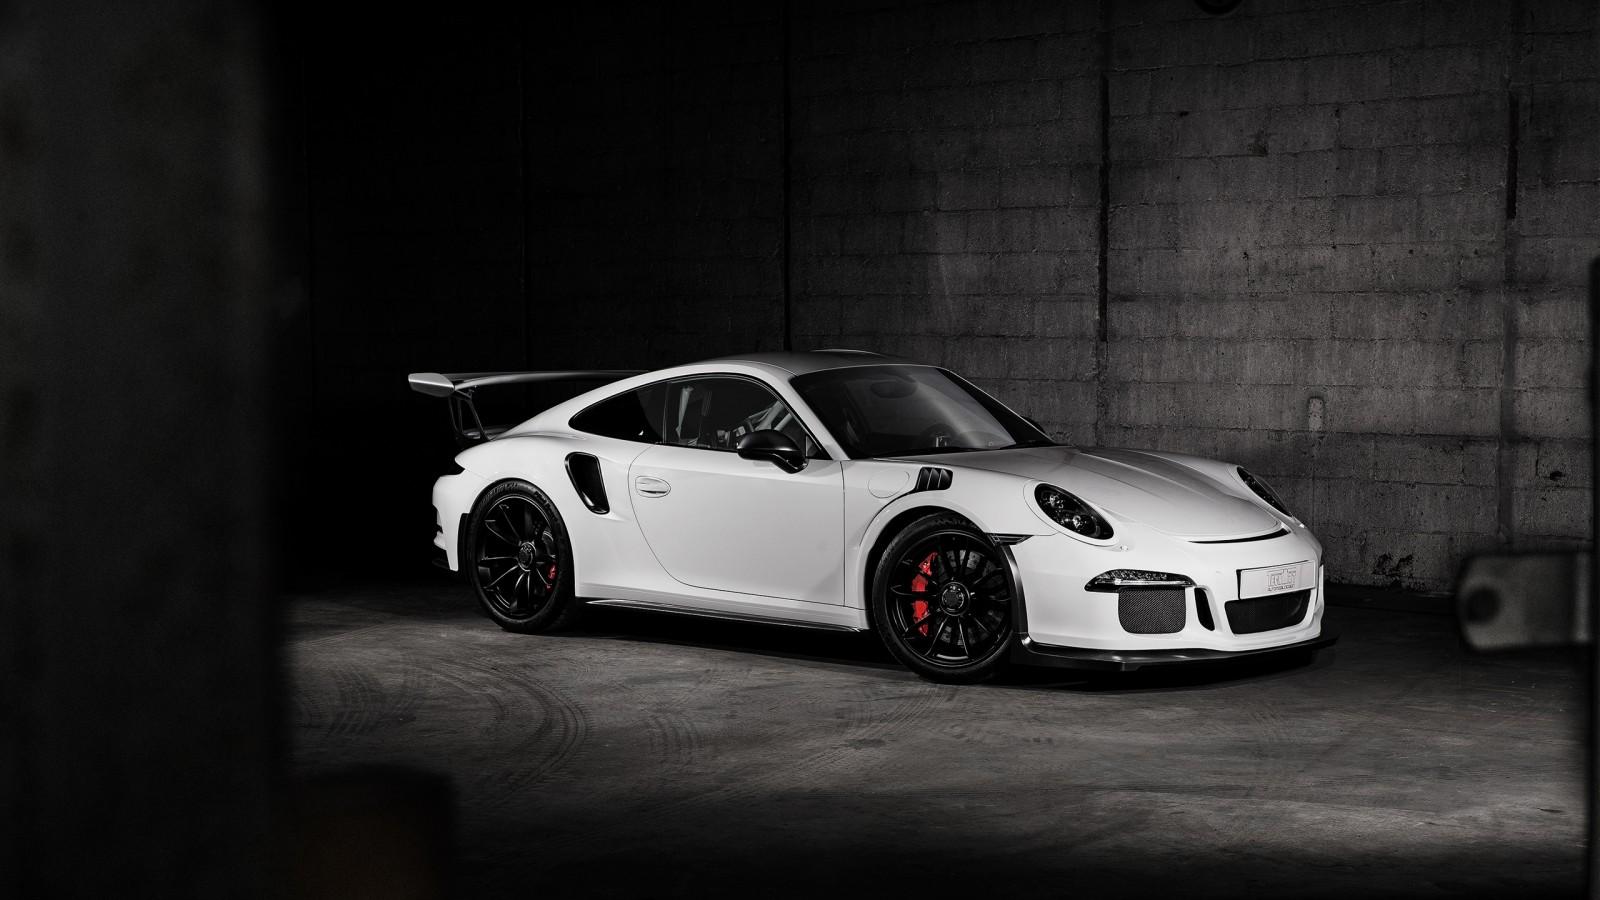 2016 Porsche 911 GT3 RS Carbon TechArt Wallpaper | HD Car ...